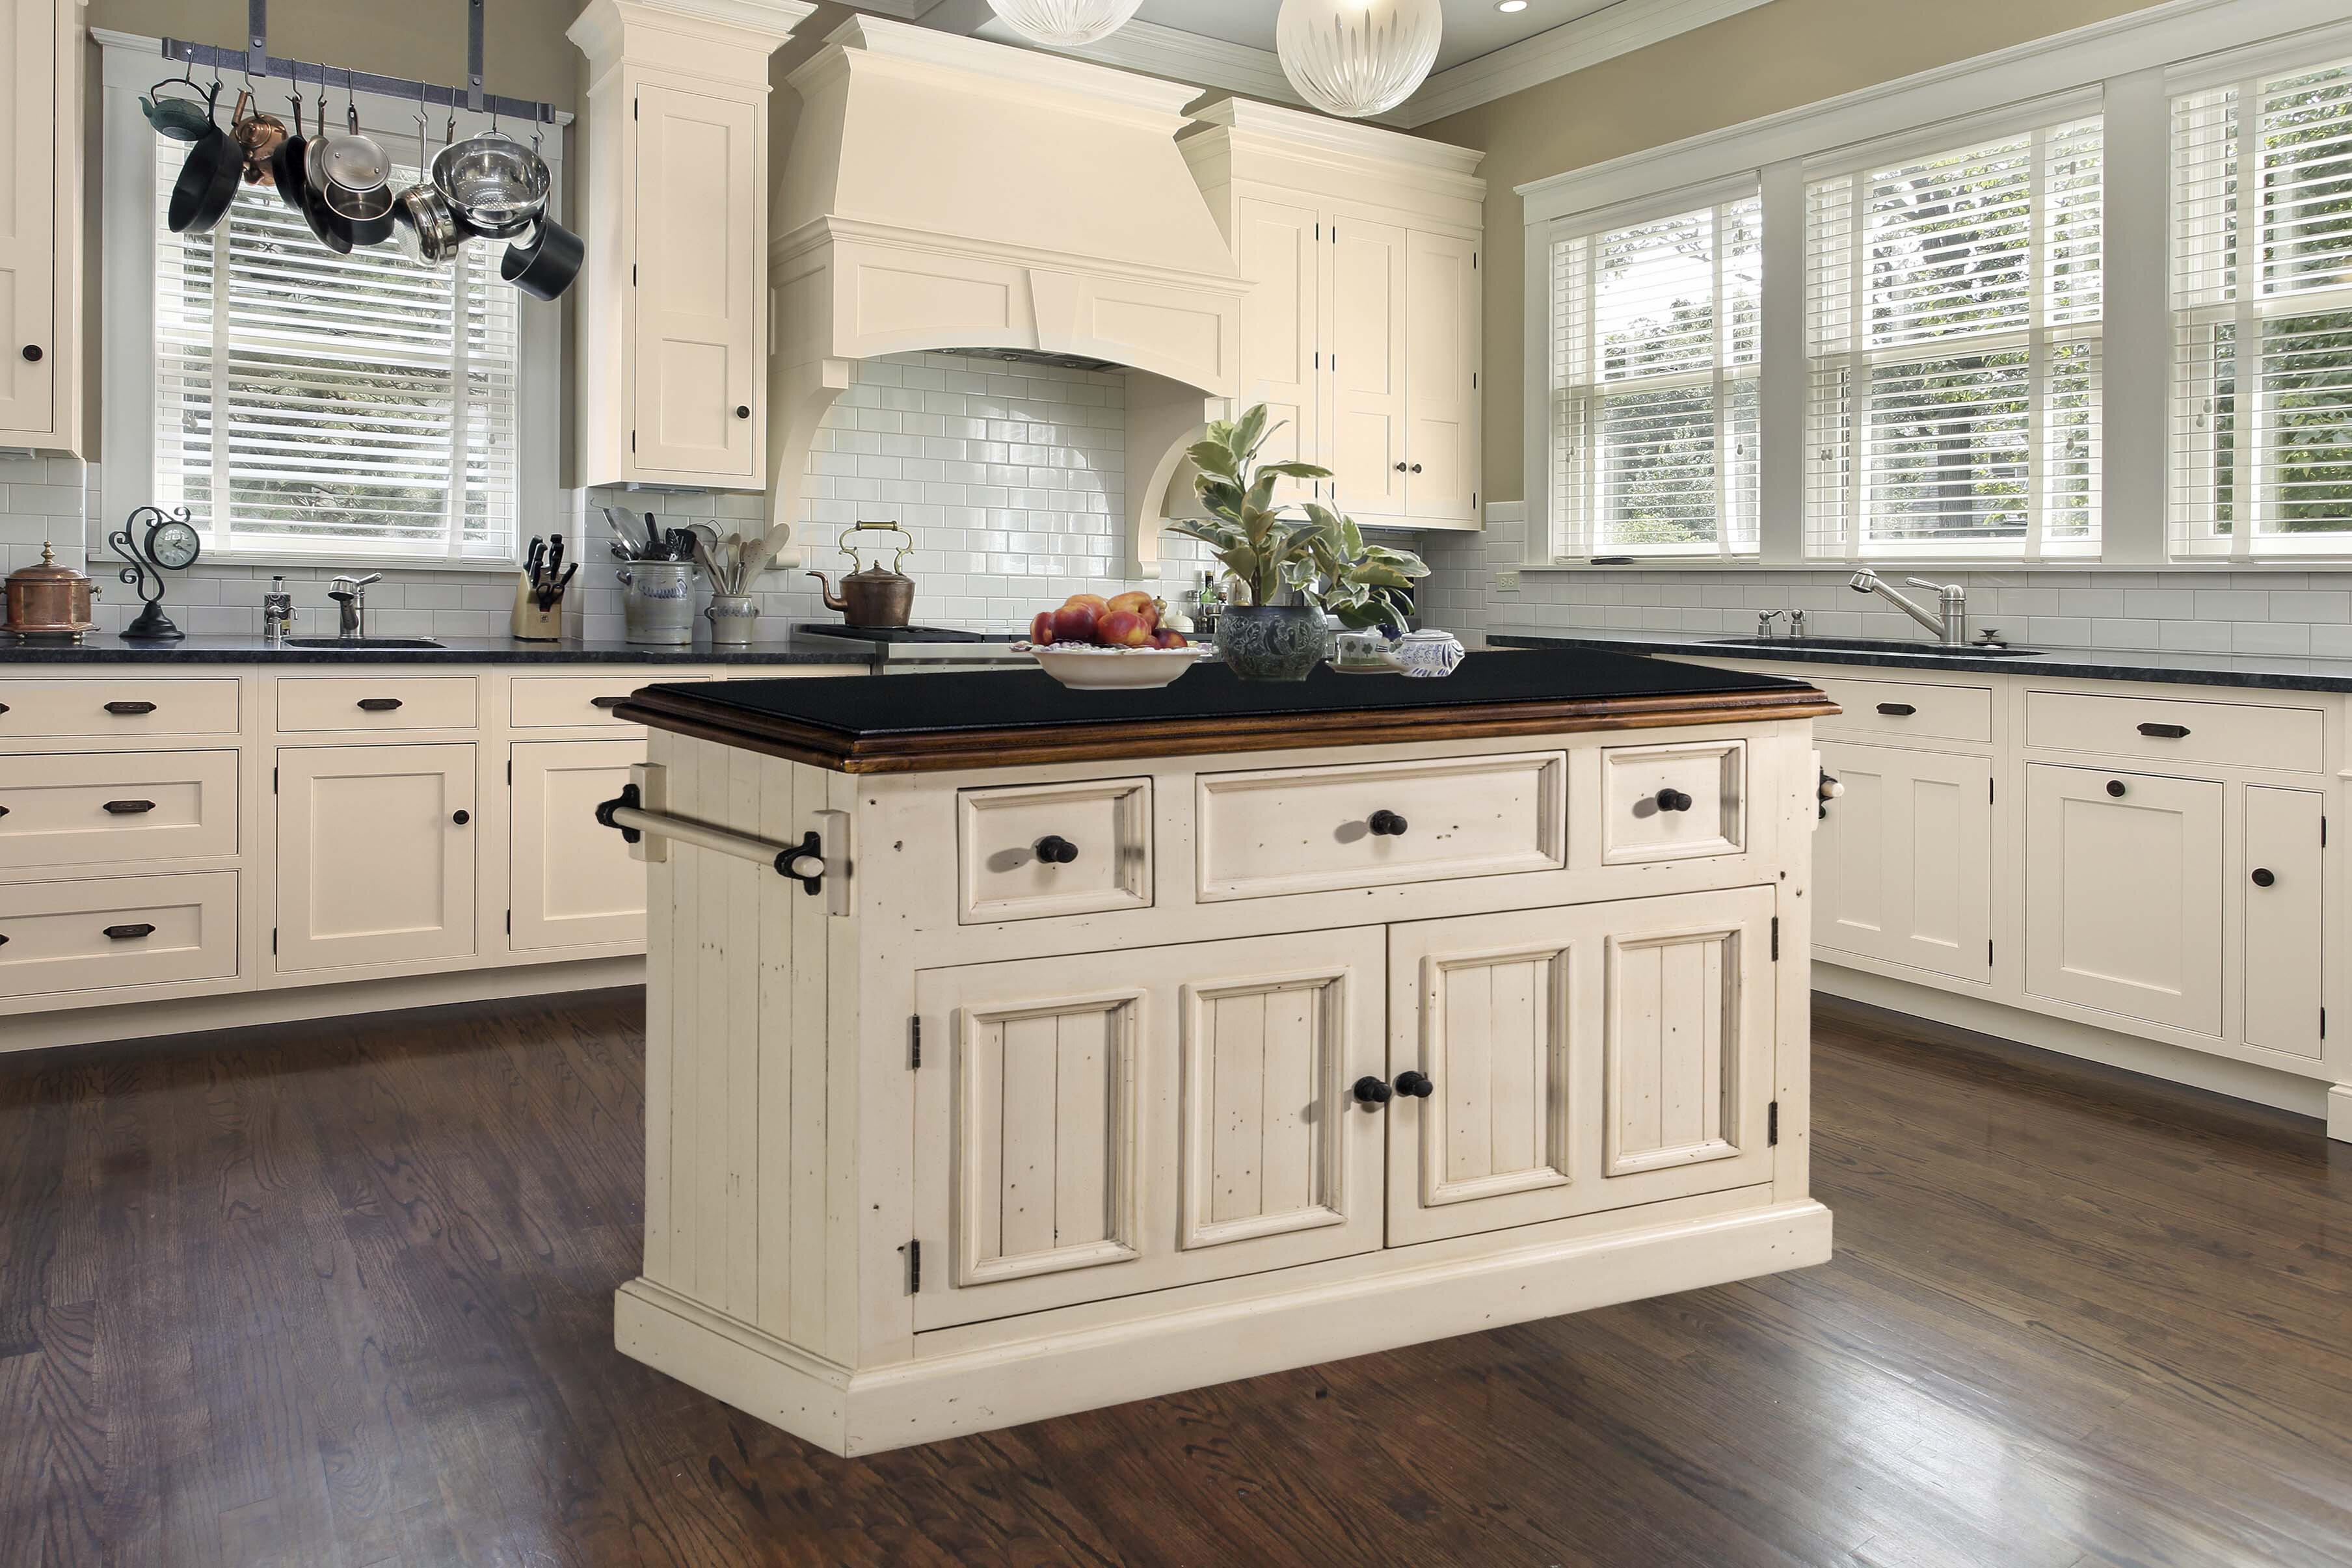 Granite Kitchen Islands Carts You Ll Love In 2020 Wayfair